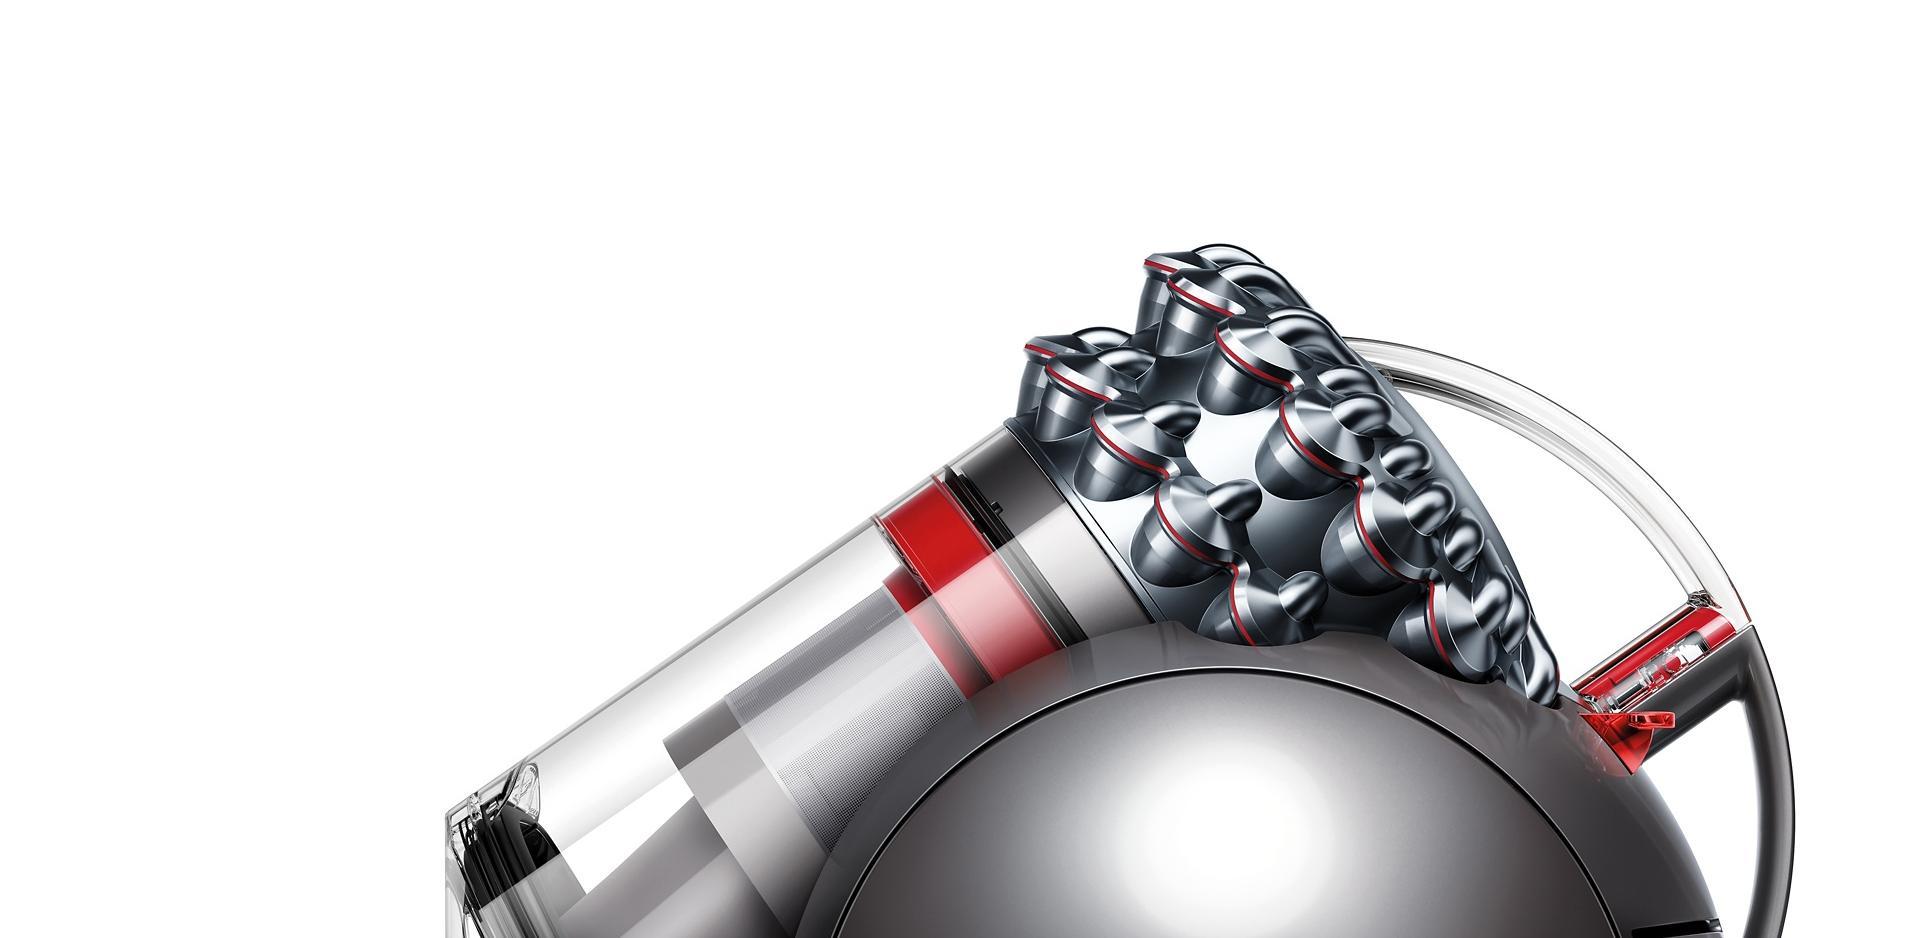 Dyson Cinetic Big Ball Vacuum Cleaner Dyson Nz